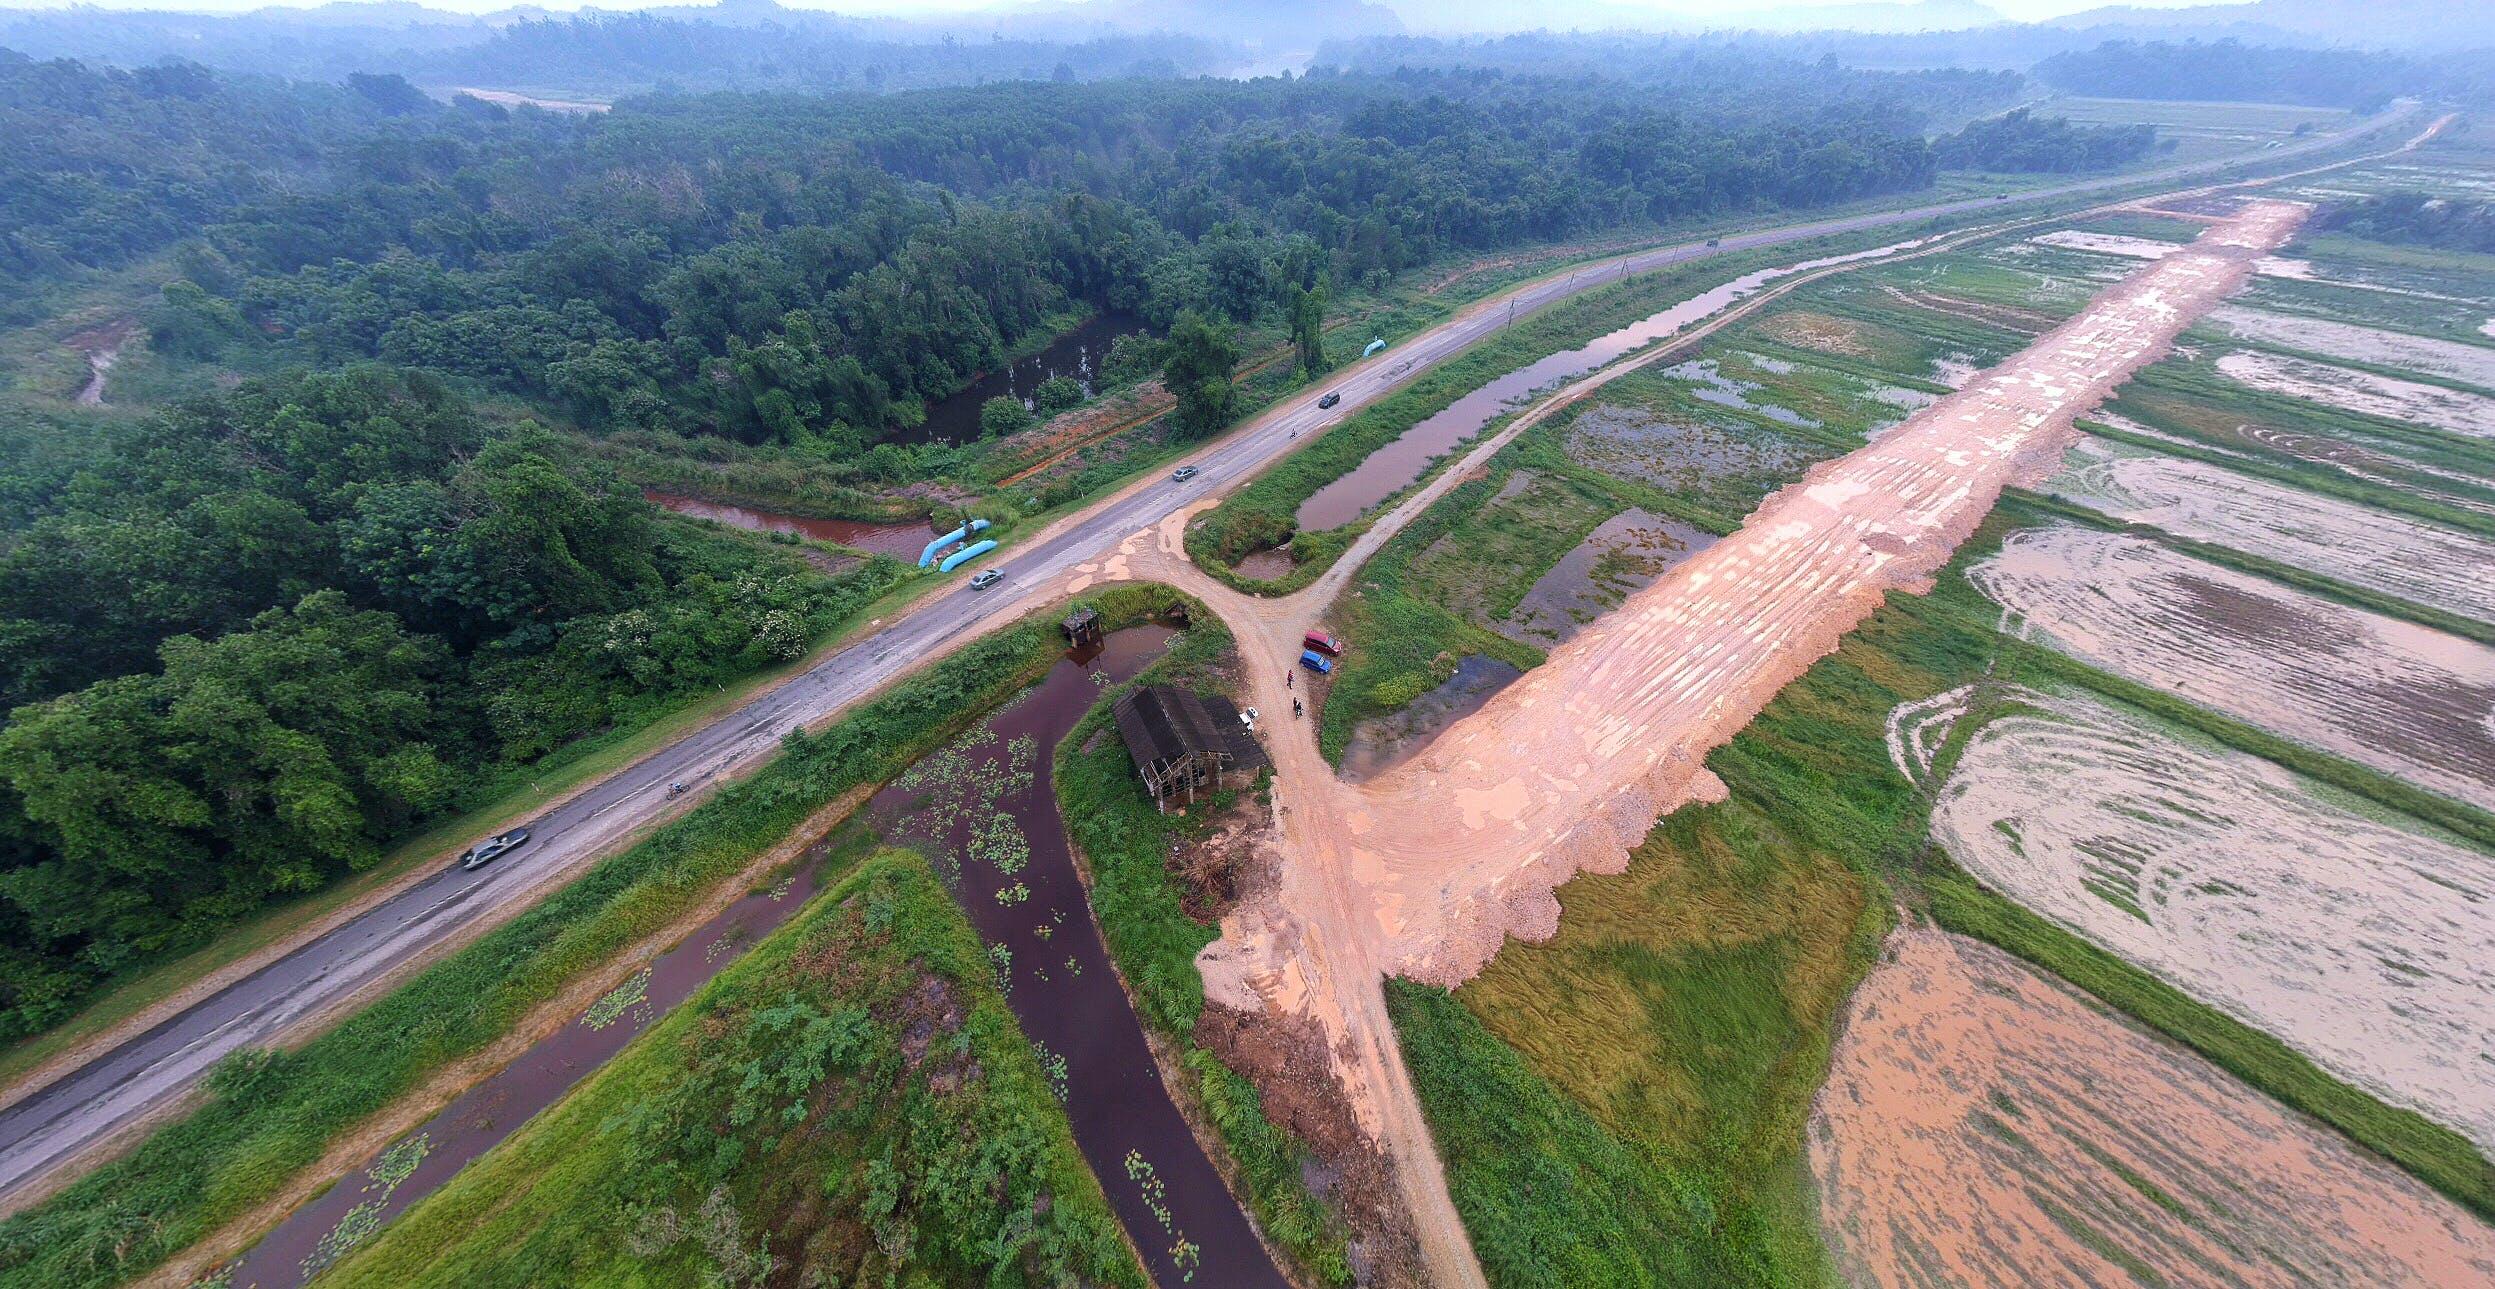 aerial, asphalt, countryside